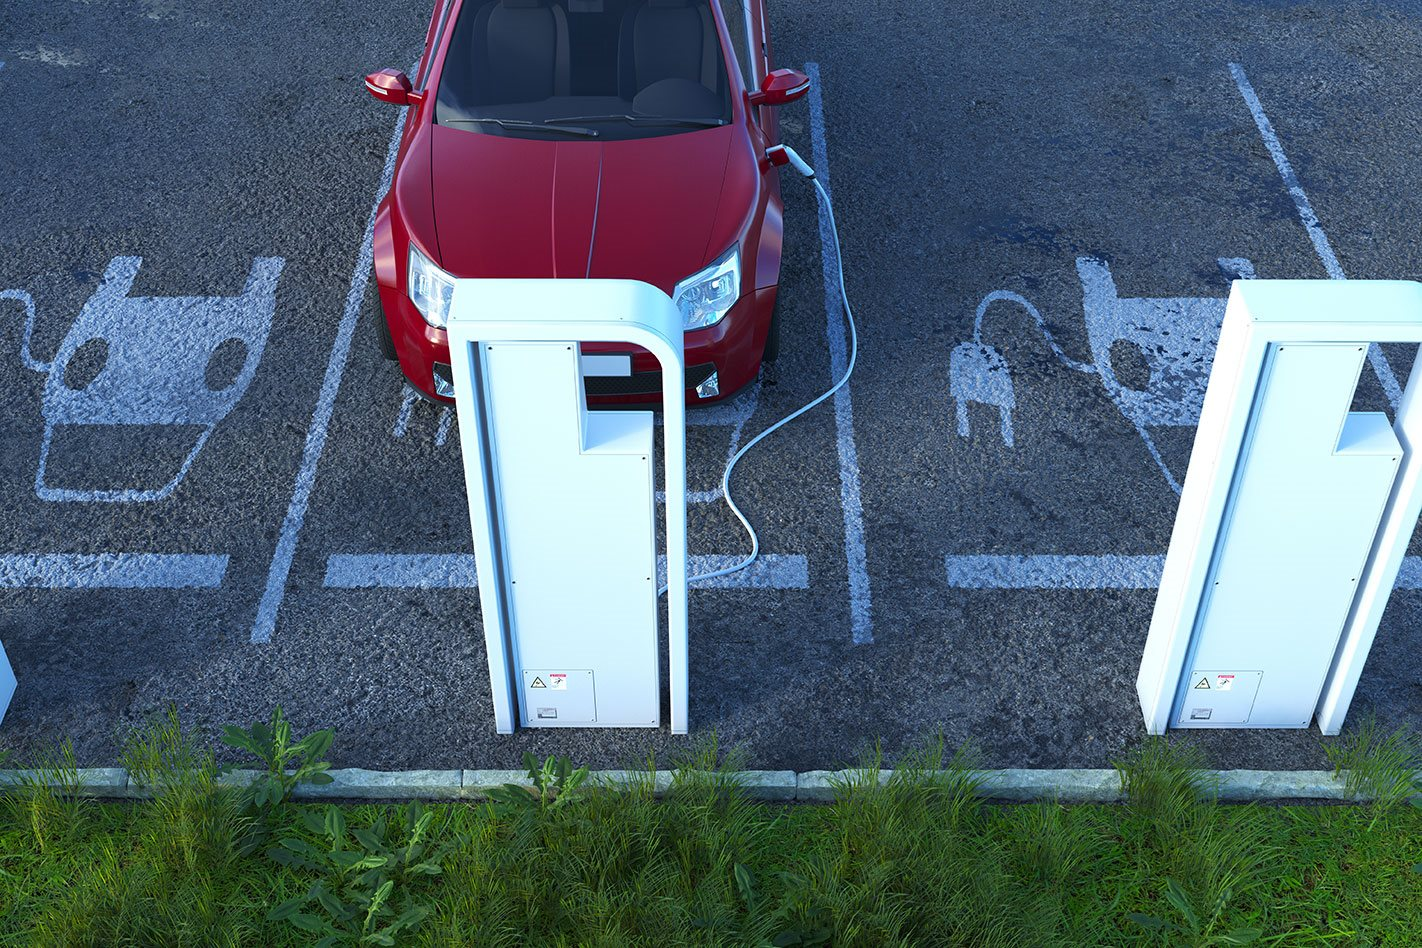 Charging EVs